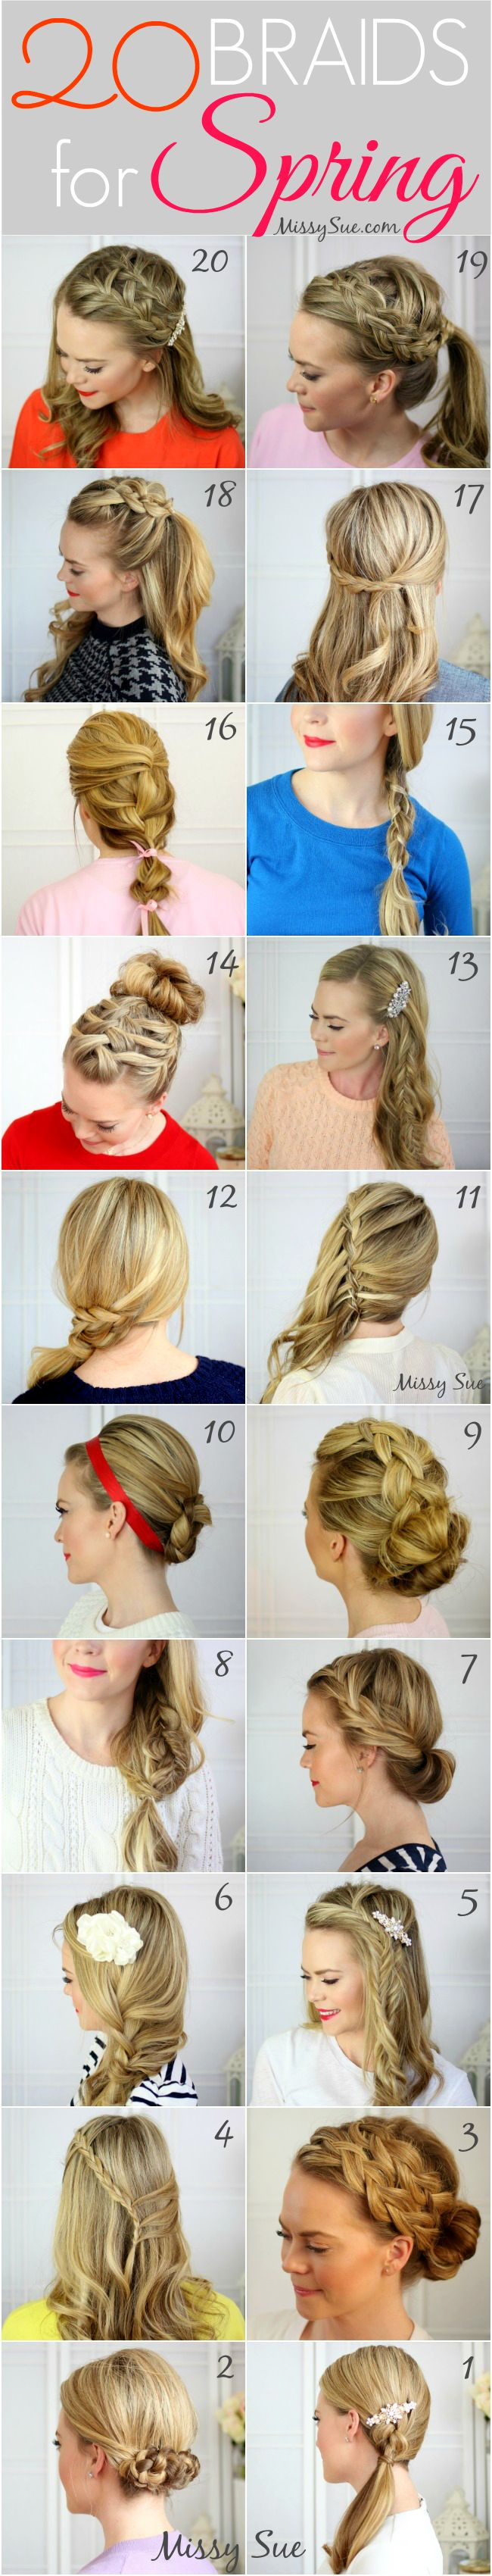 20 Braids for Spring @Elizabeth Lockhart Lockhart Lockhart Lockhart Lockhart Lockhart Fetherolf this girl has great braiding tutorials